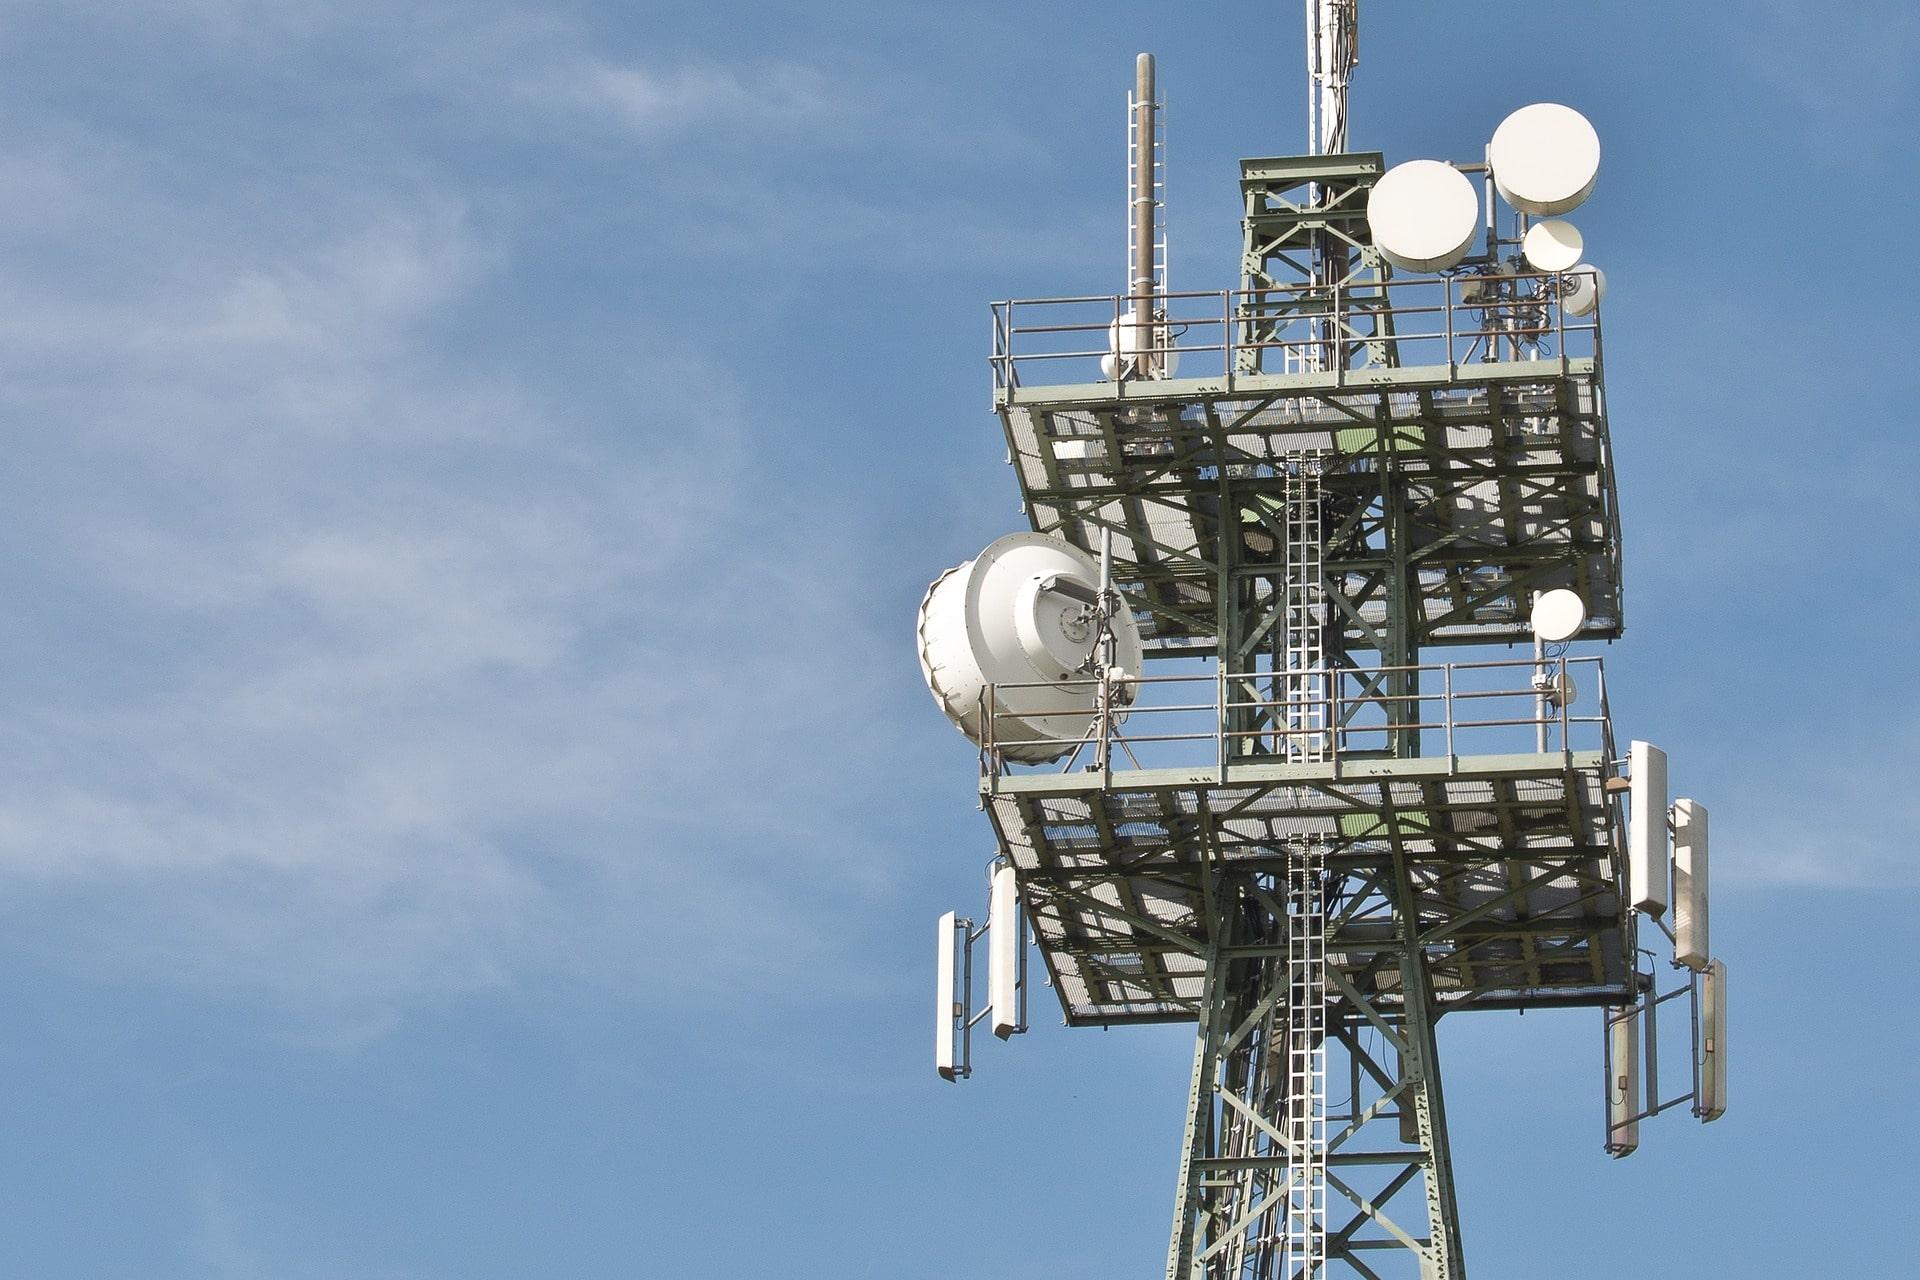 ptt over cellular mast